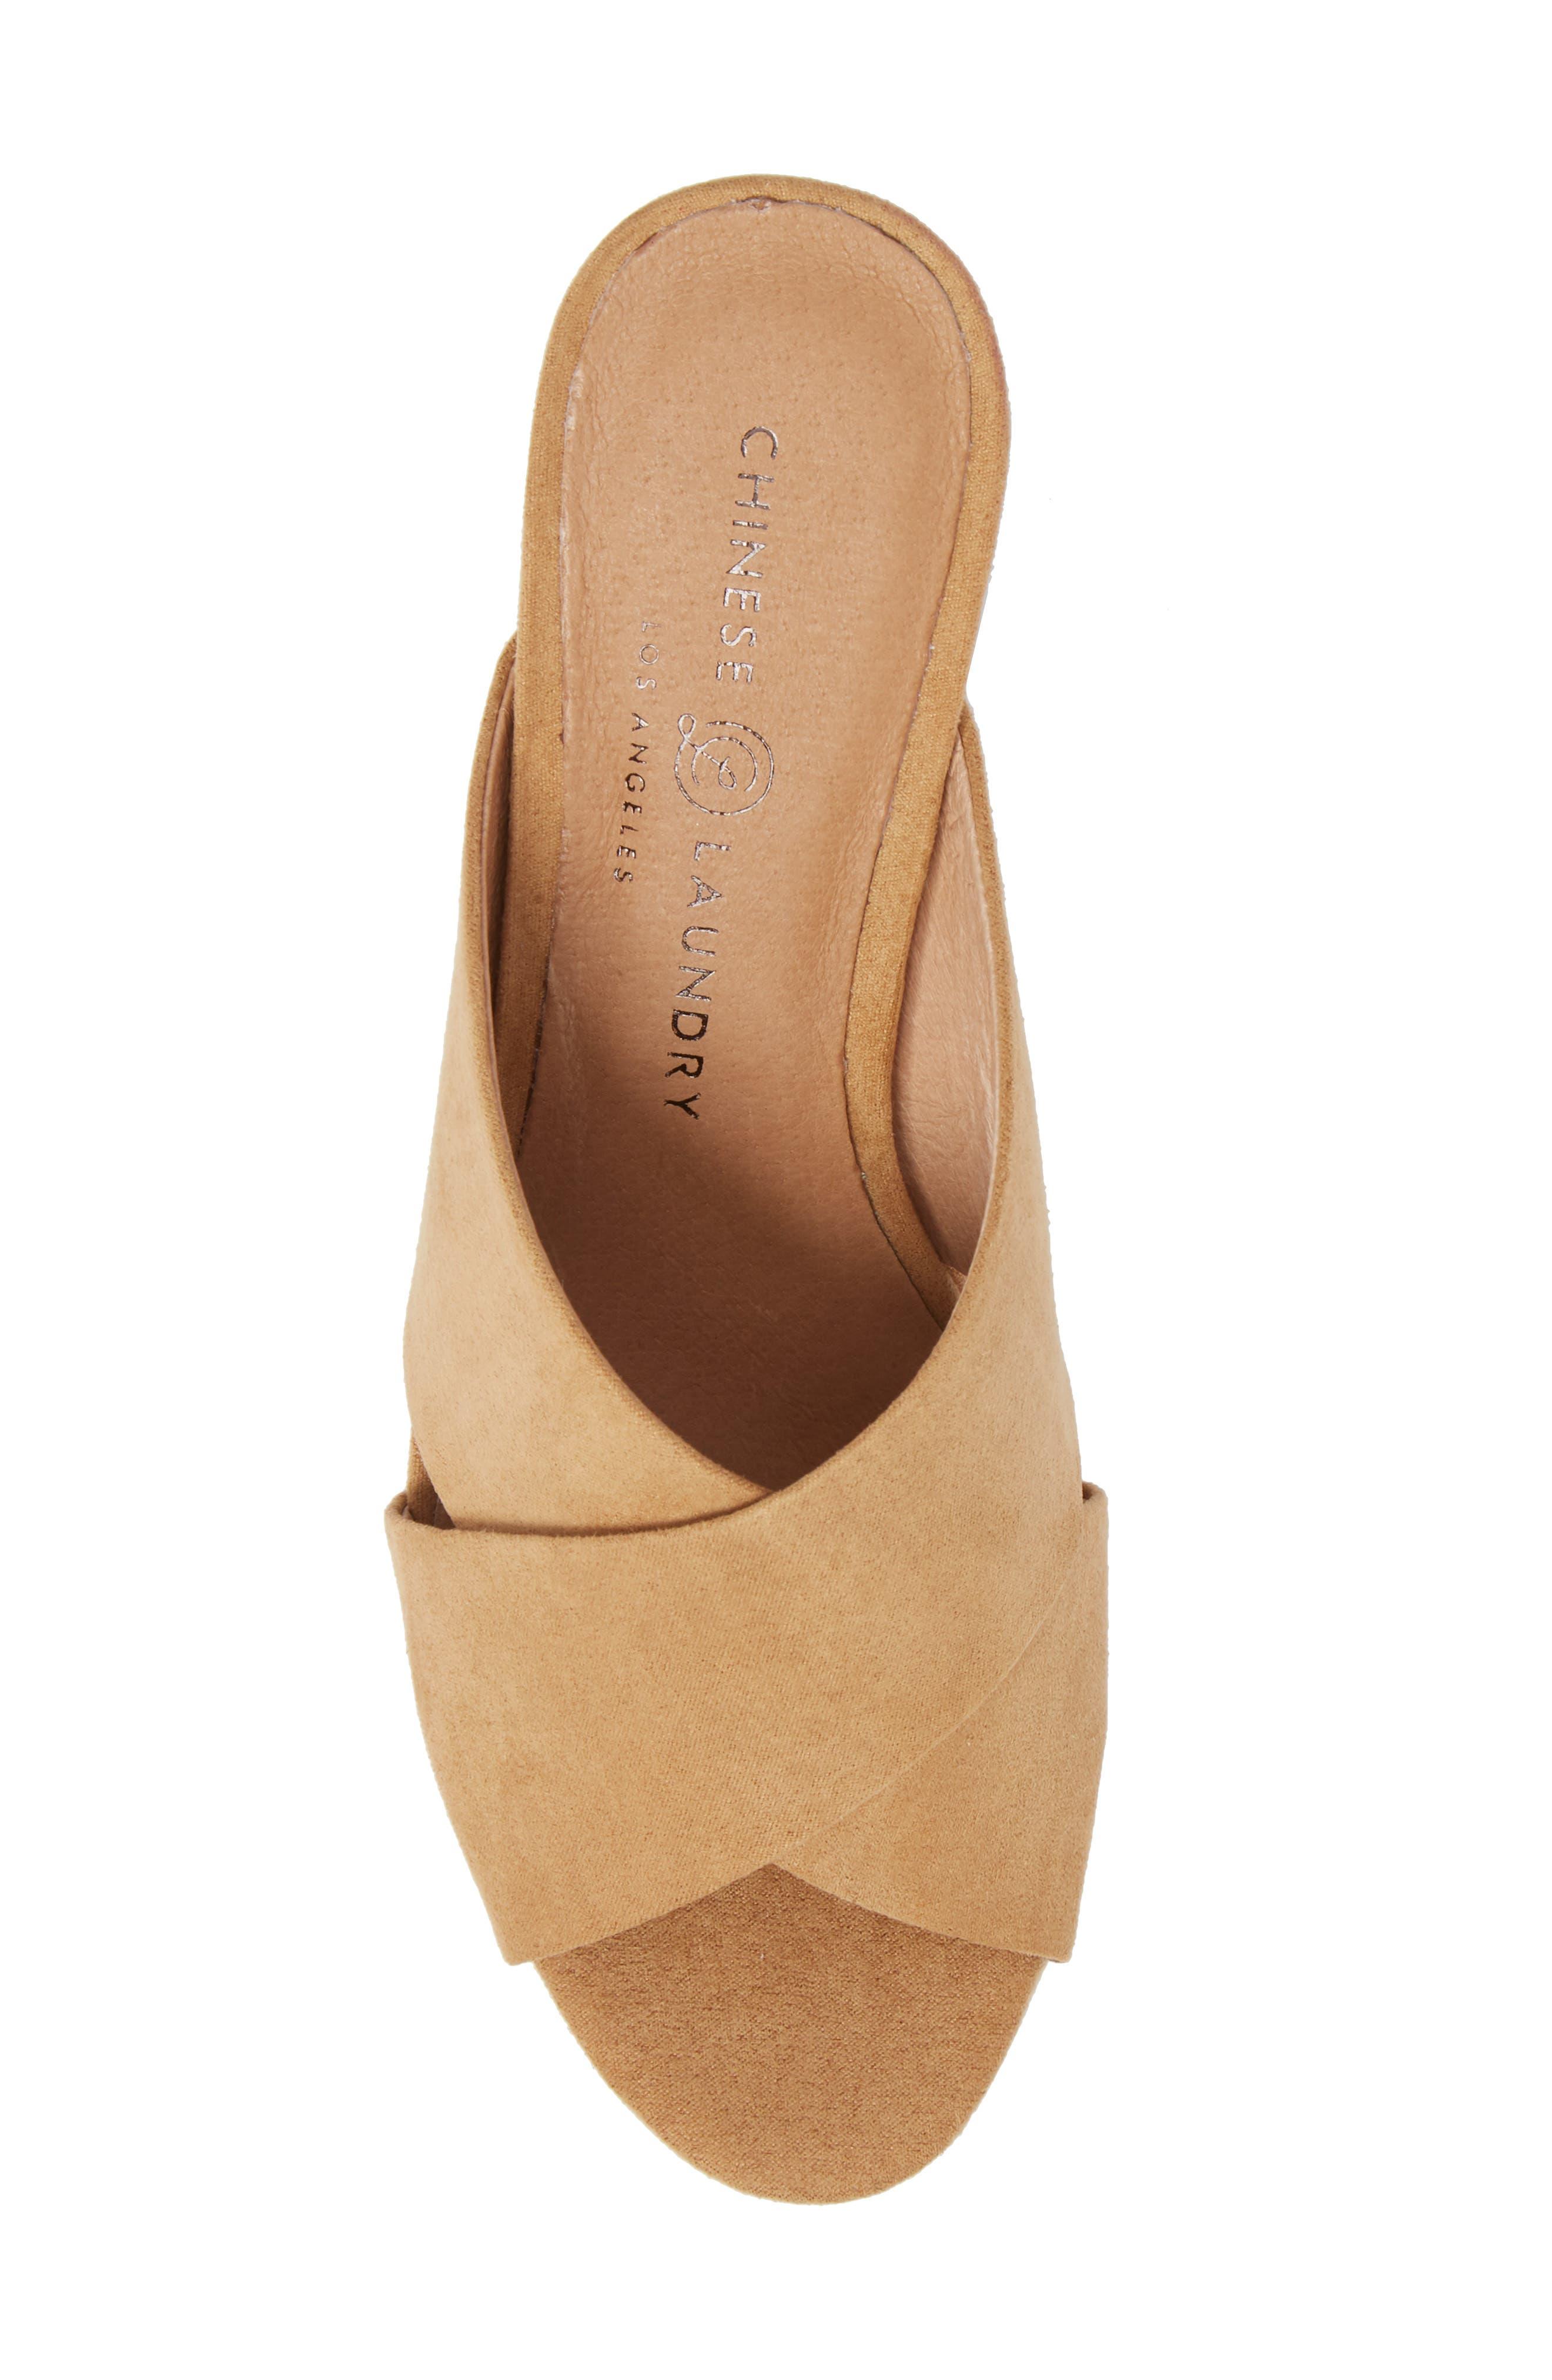 Teagan Cross Strap Platform Sandal,                             Alternate thumbnail 5, color,                             Camel